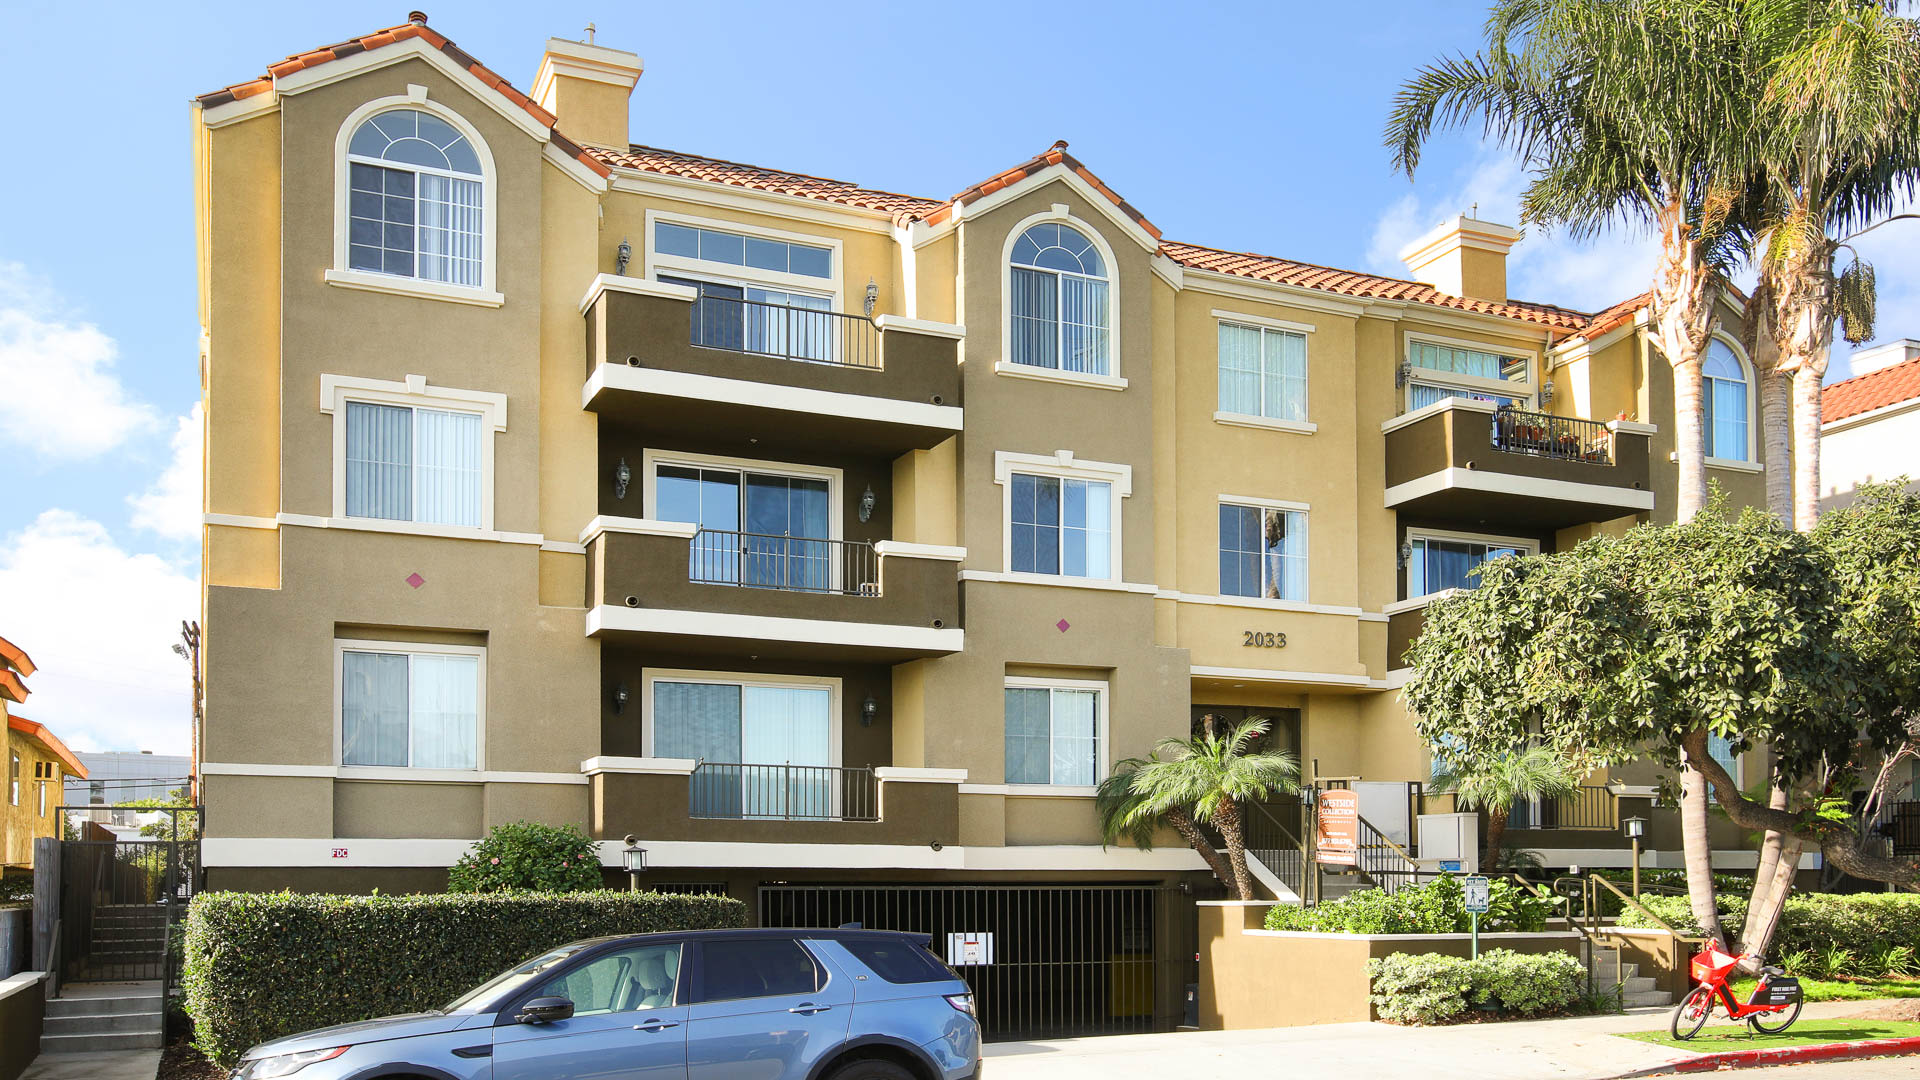 Westside on Beloit Apartments - Exterior